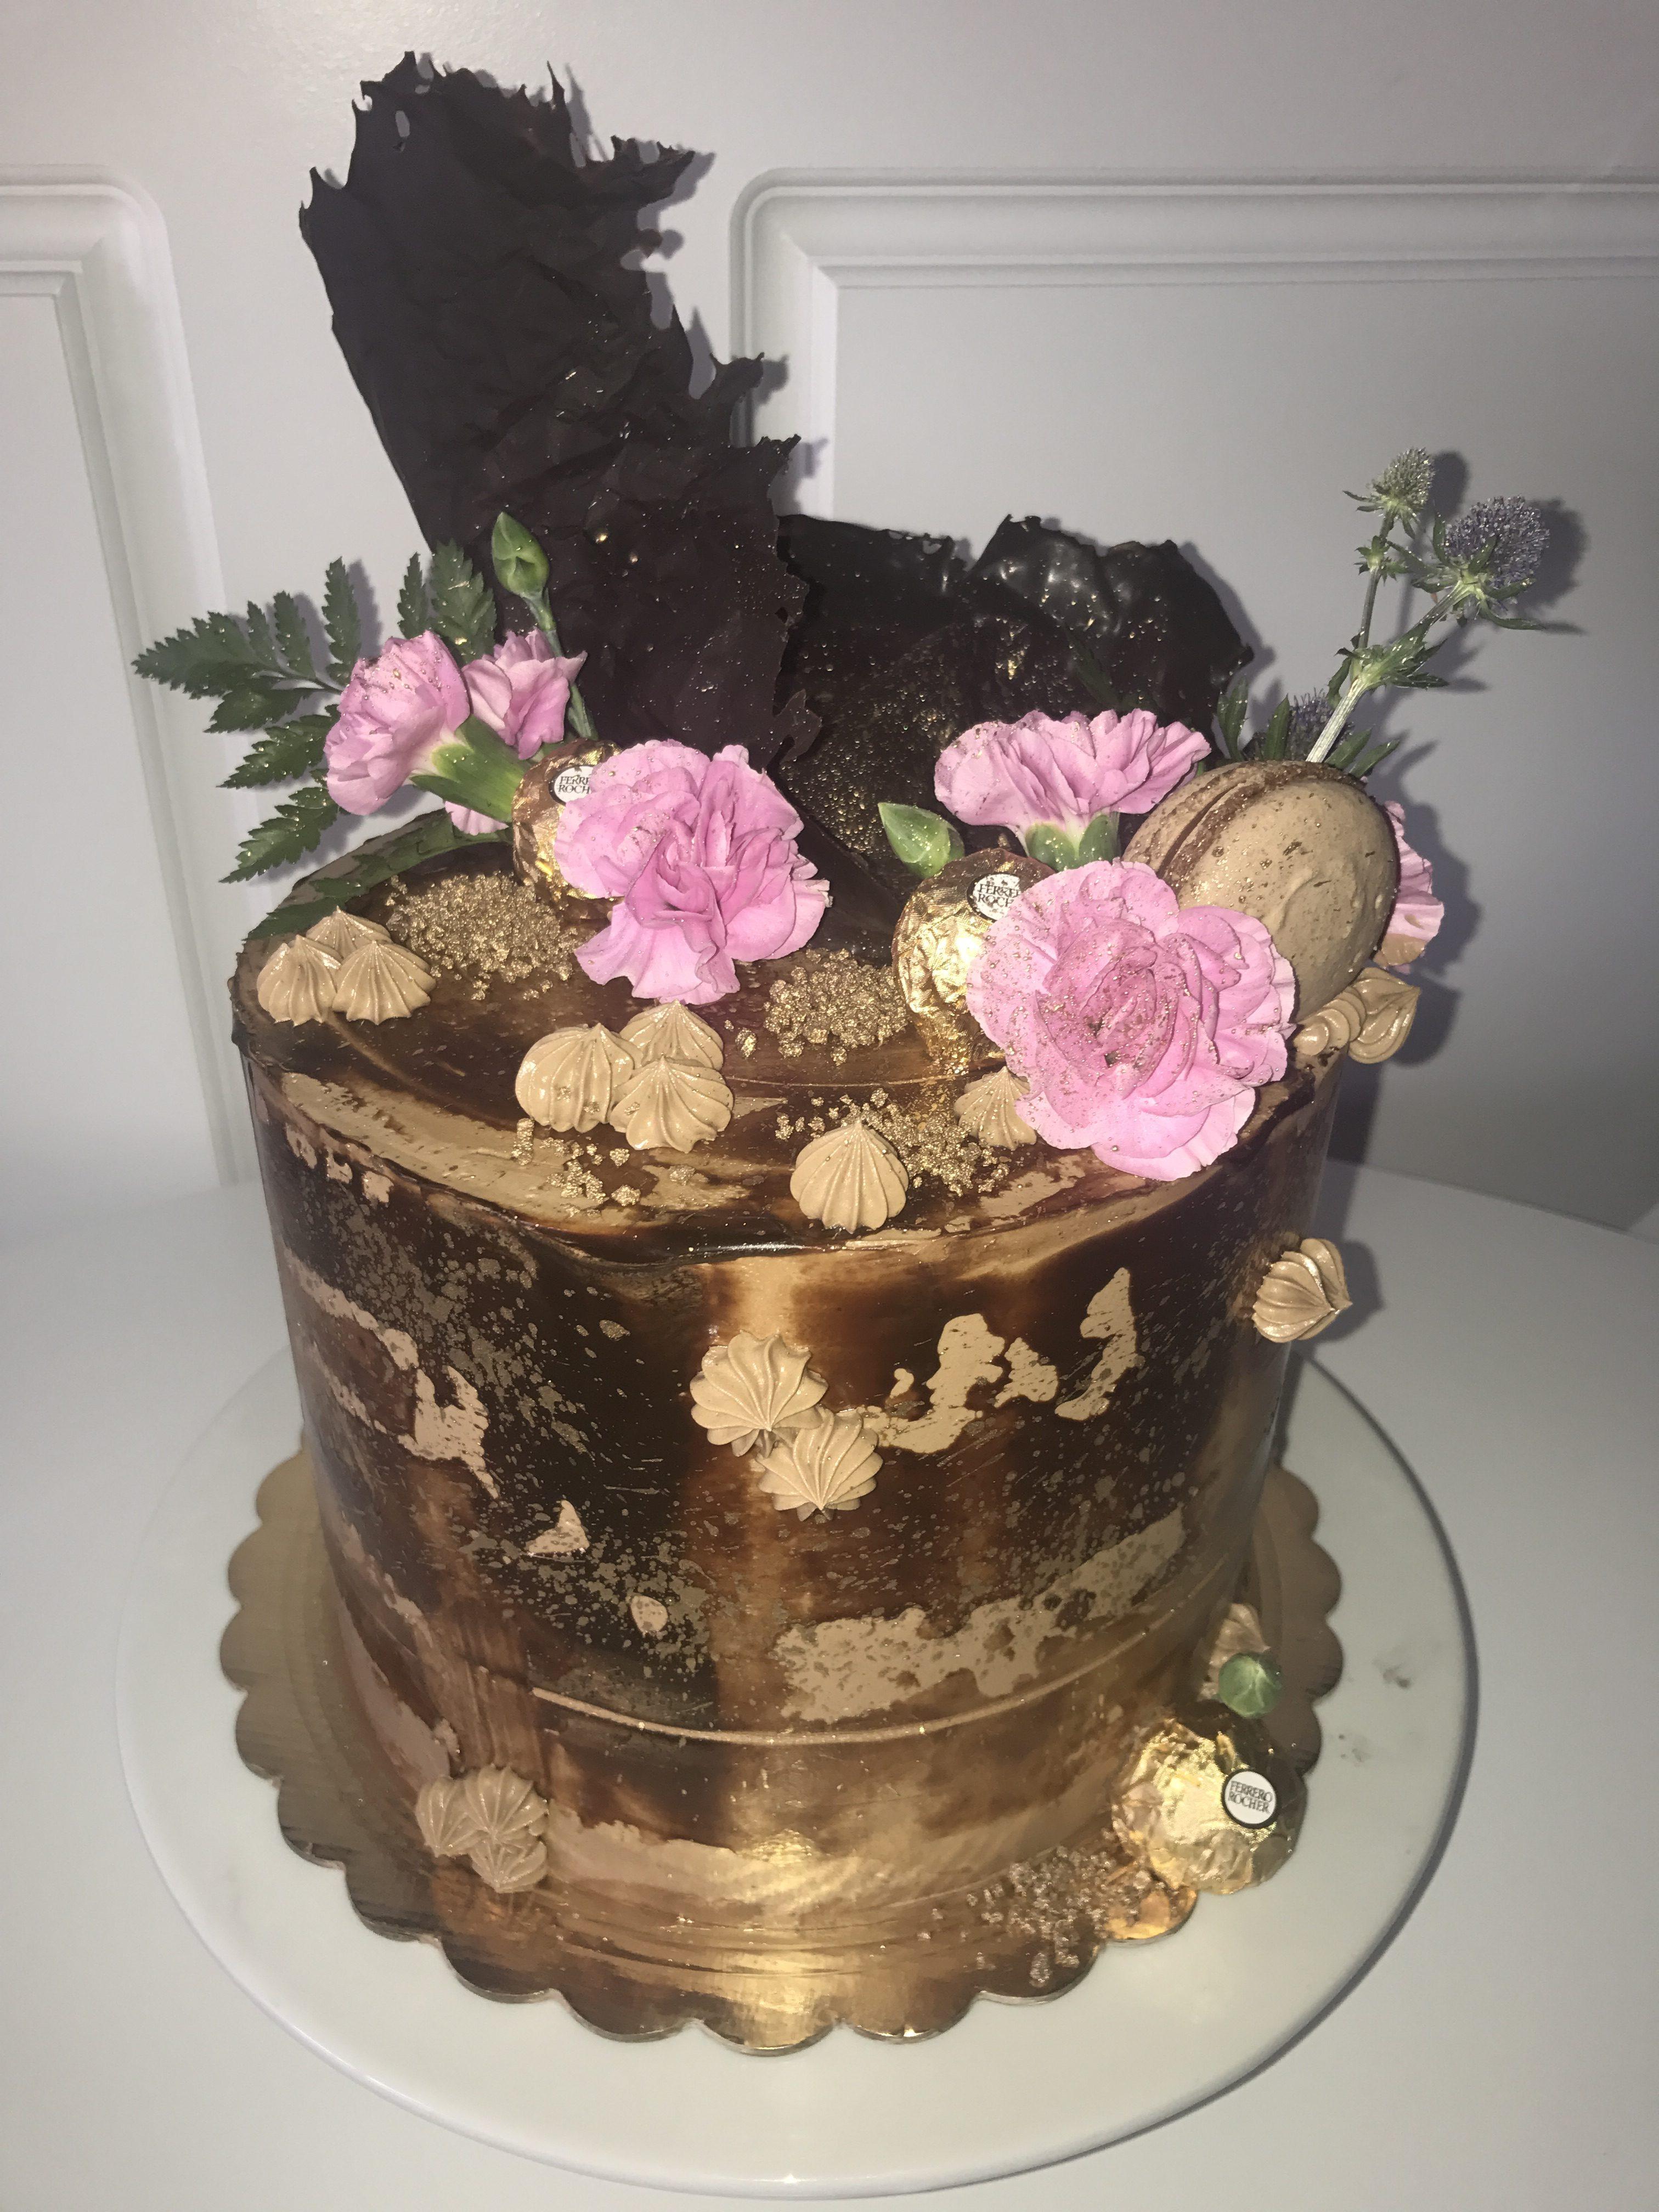 8'' ghirardelli chocolate cake